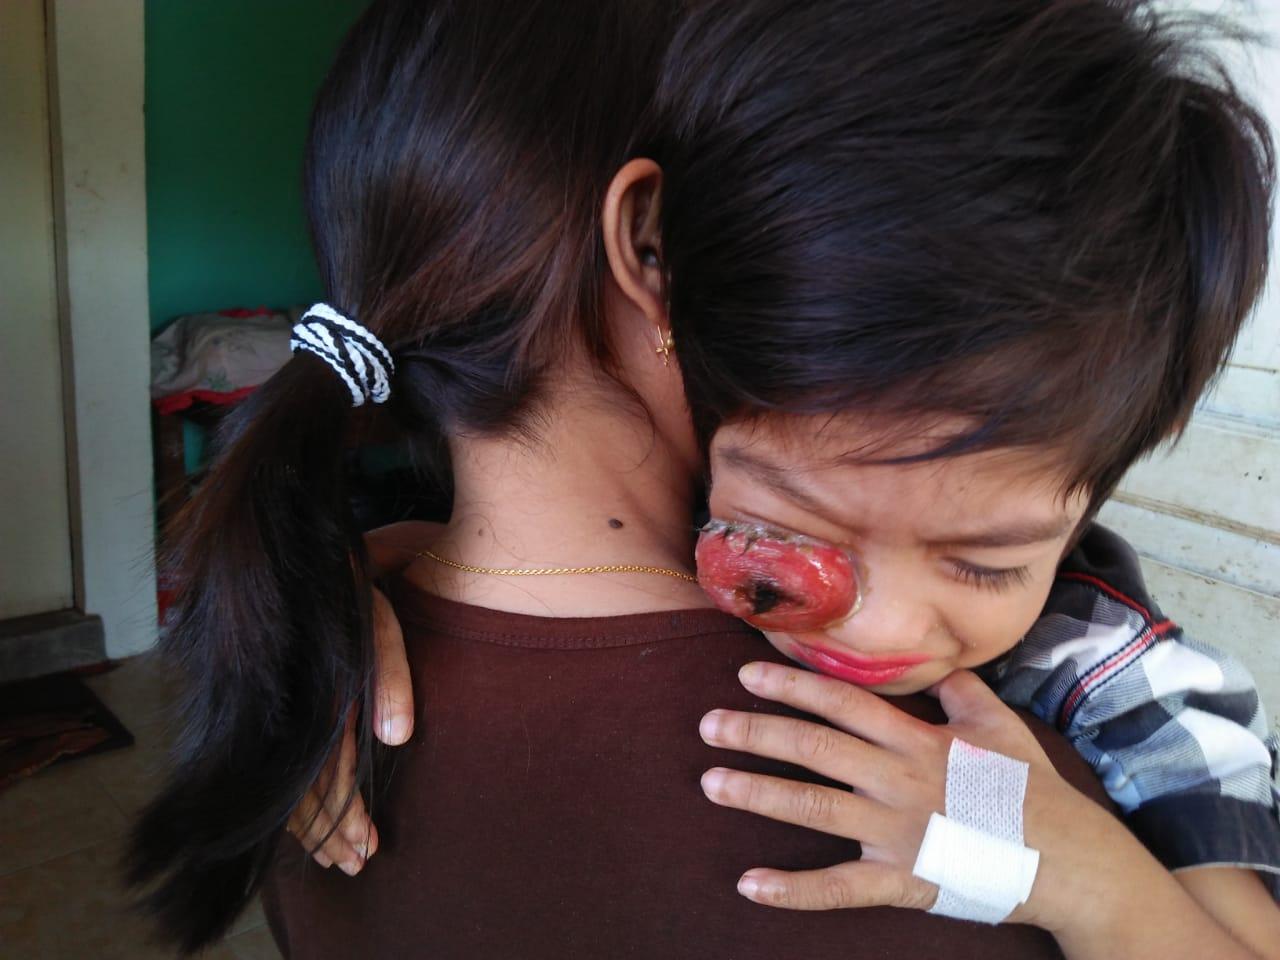 Polres Mentawai Bersama Pengurus Pramuka Serahkan Bantuan Kepada Wahyu Penderita Penyakit Tumor di Mata